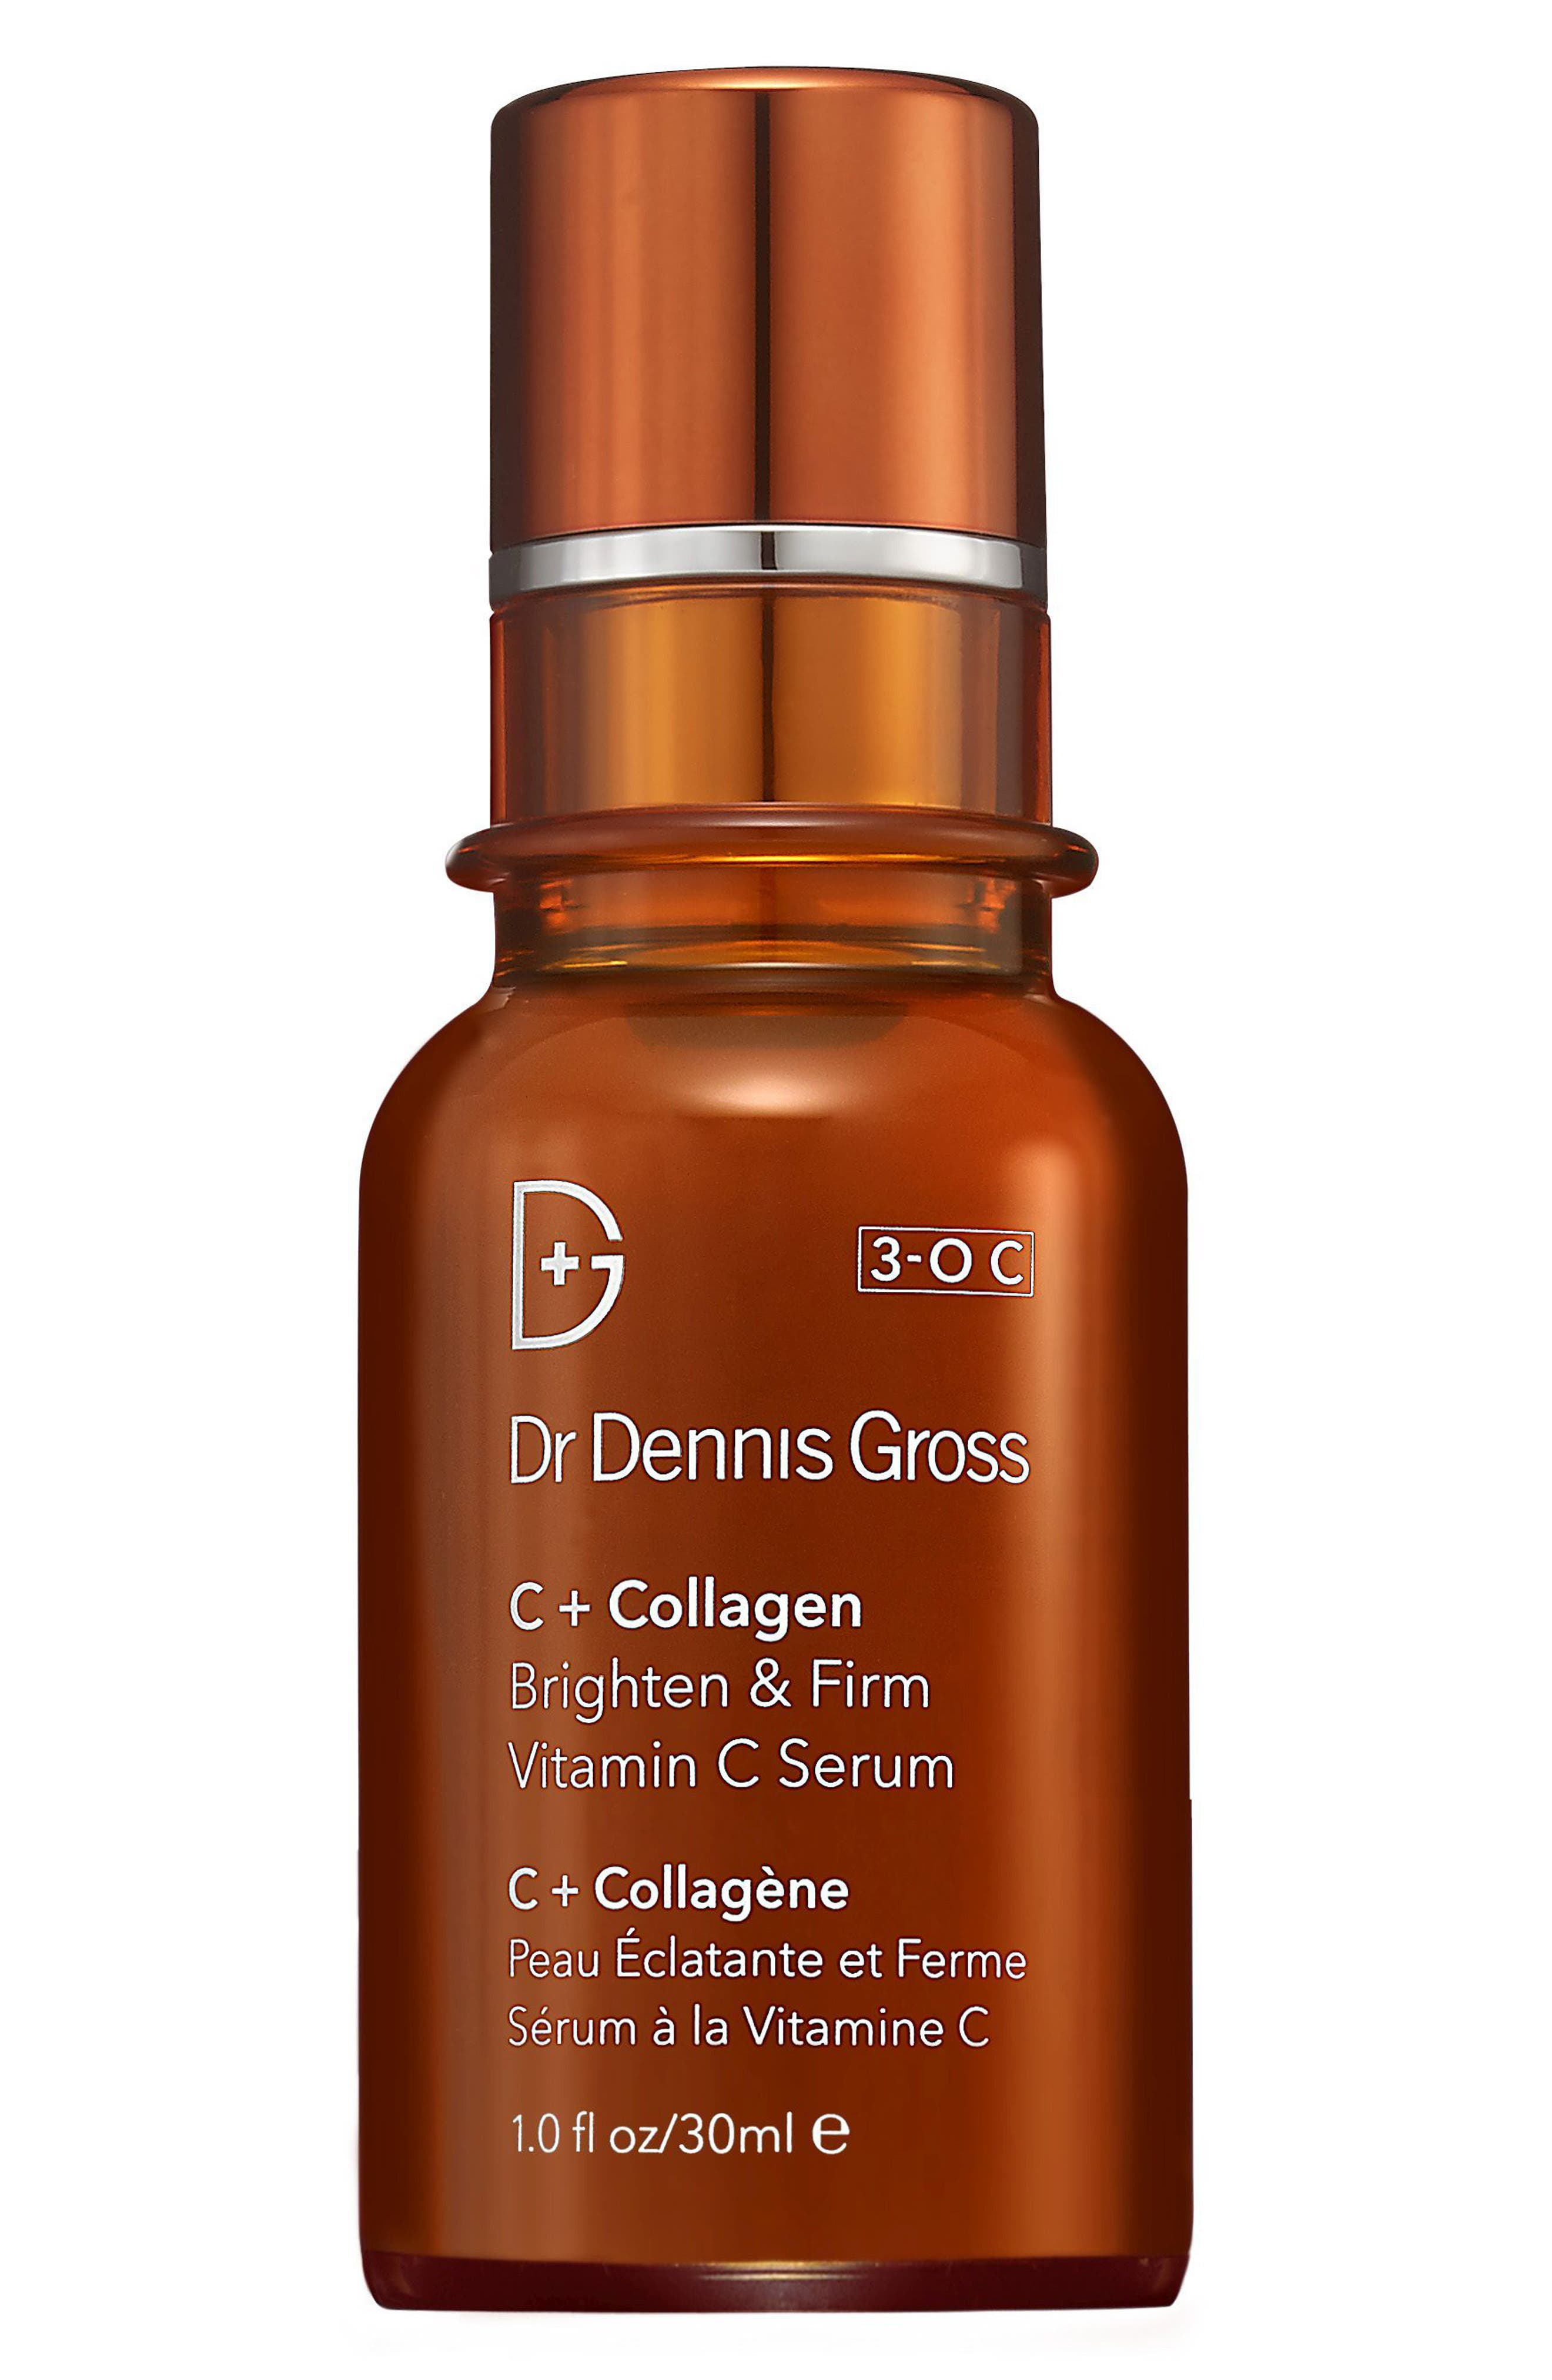 DR. DENNIS GROSS SKINCARE C+ Collagen Brighten & Firm Vitamin C Serum, Main, color, NO COLOR